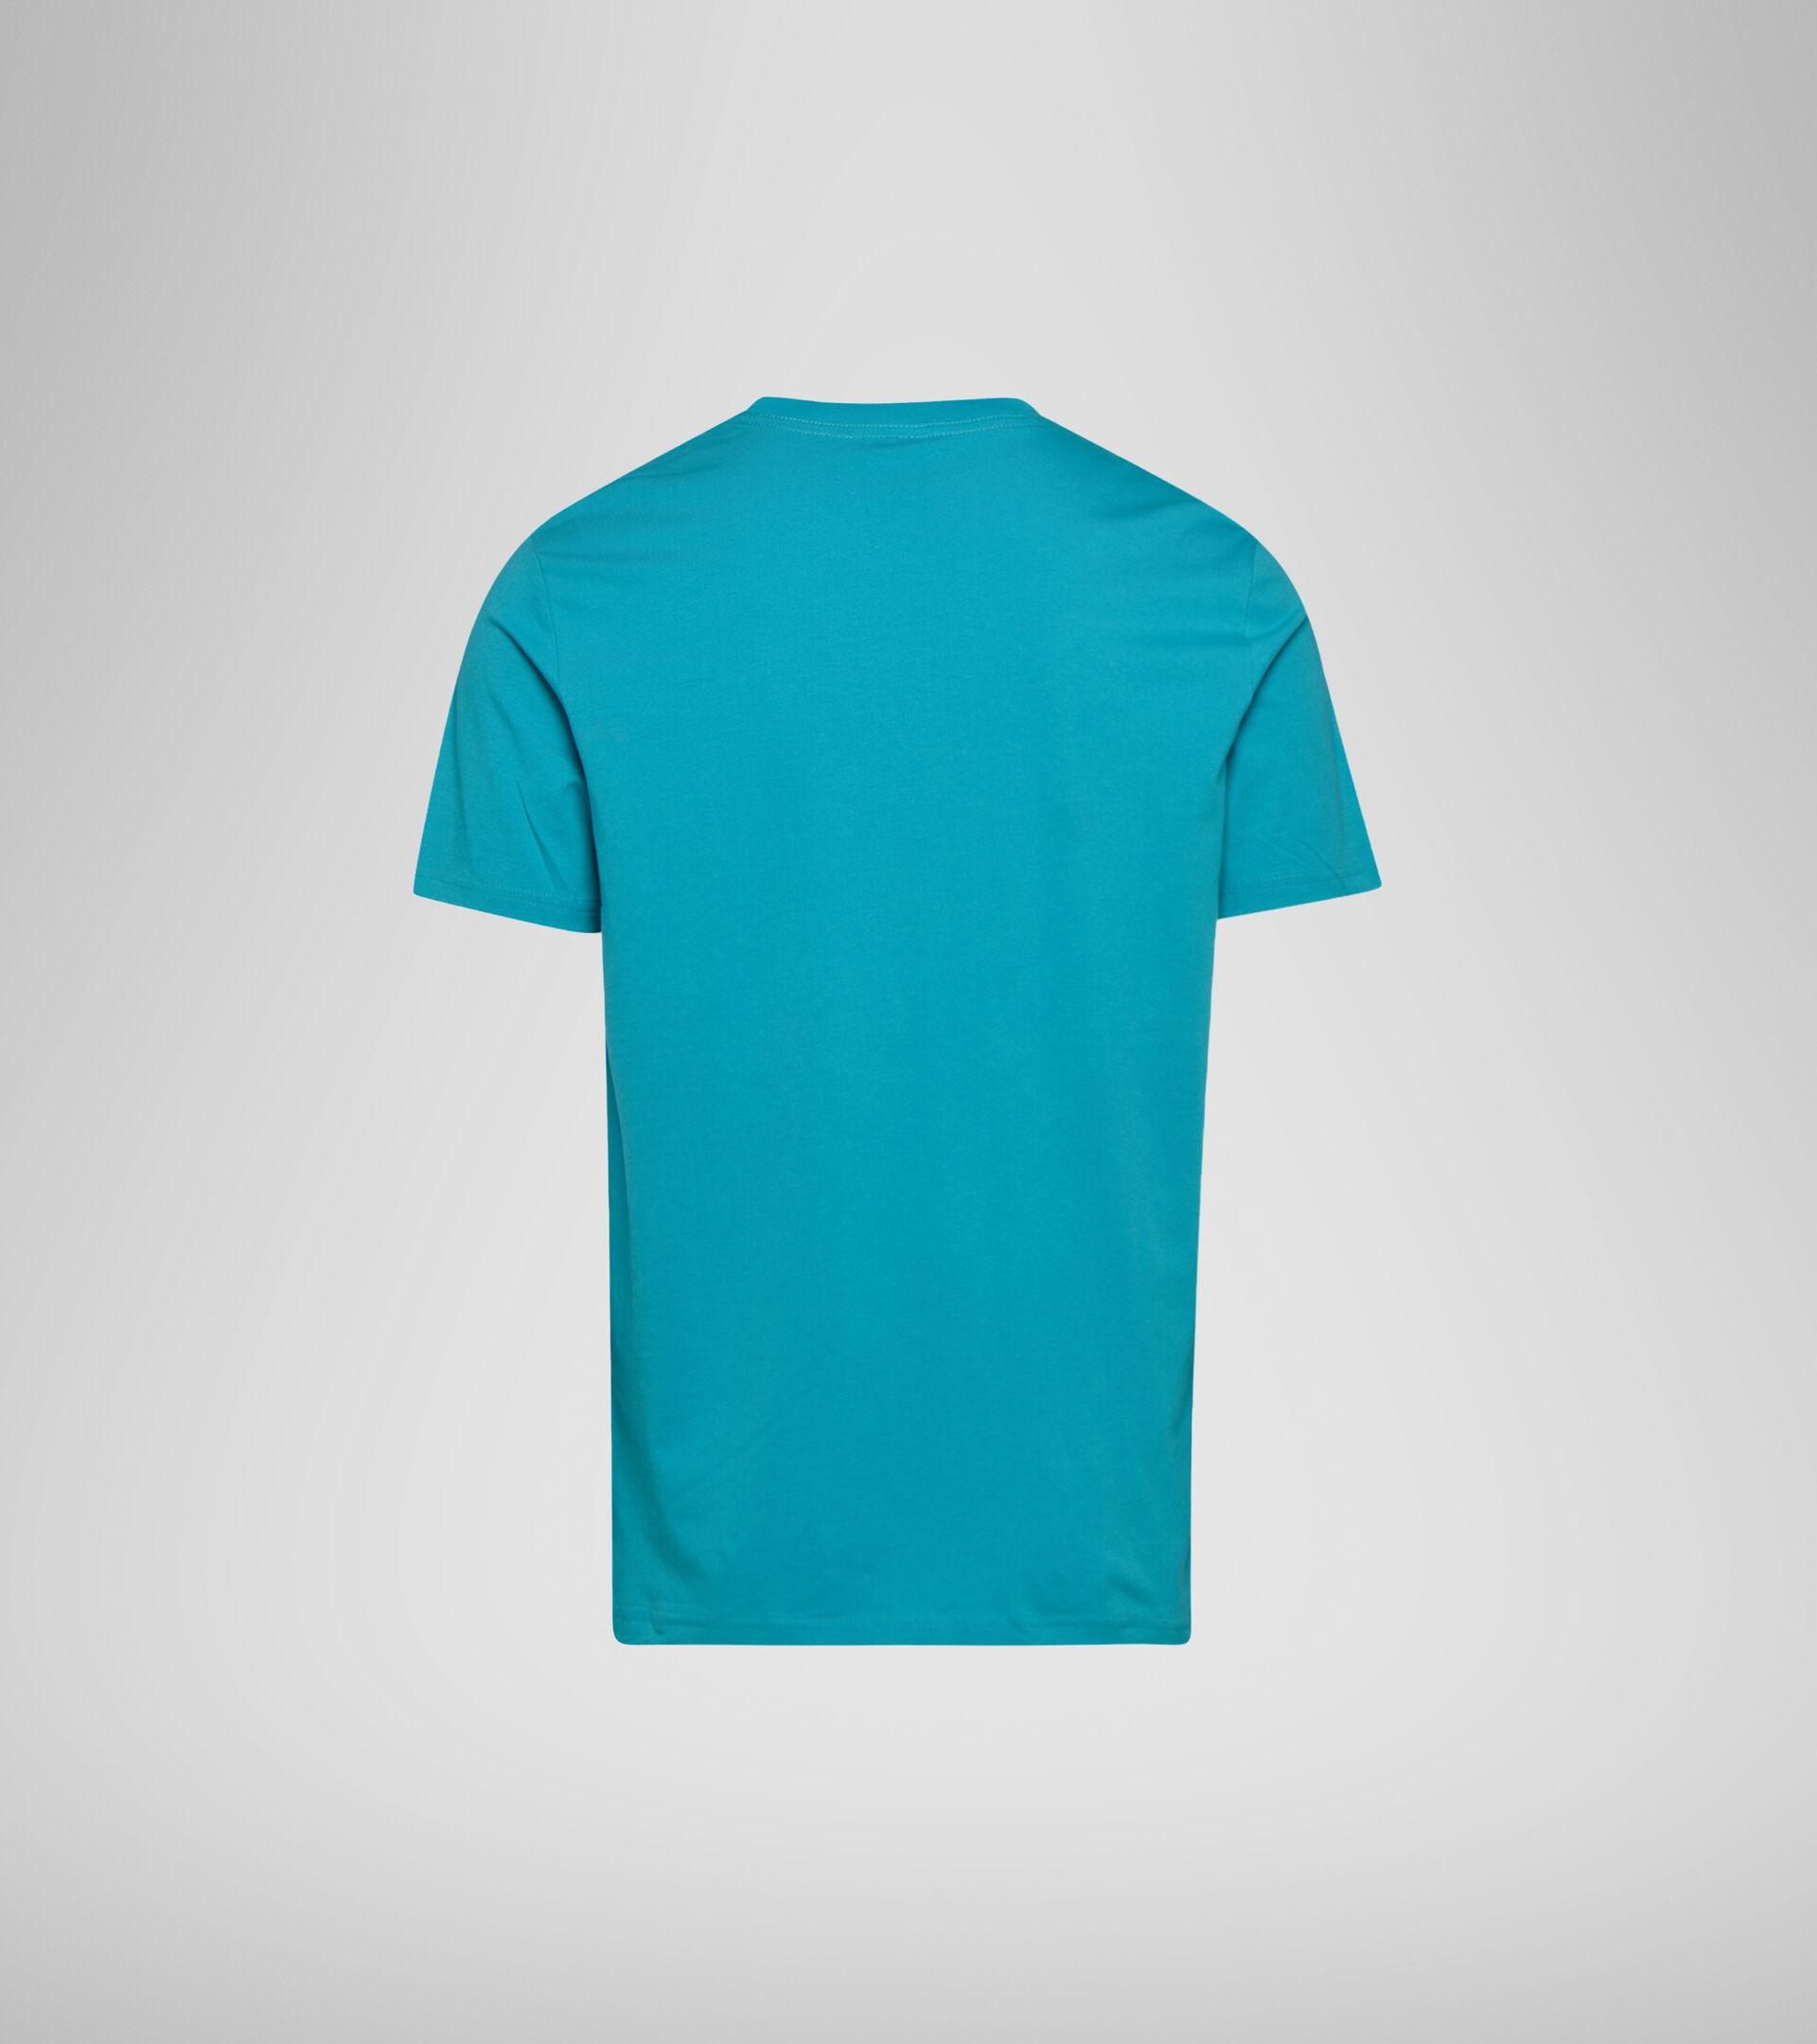 Apparel Sportswear UOMO SS T-SHIRT SPECTRA OC VERDE VIRIDIAN Diadora